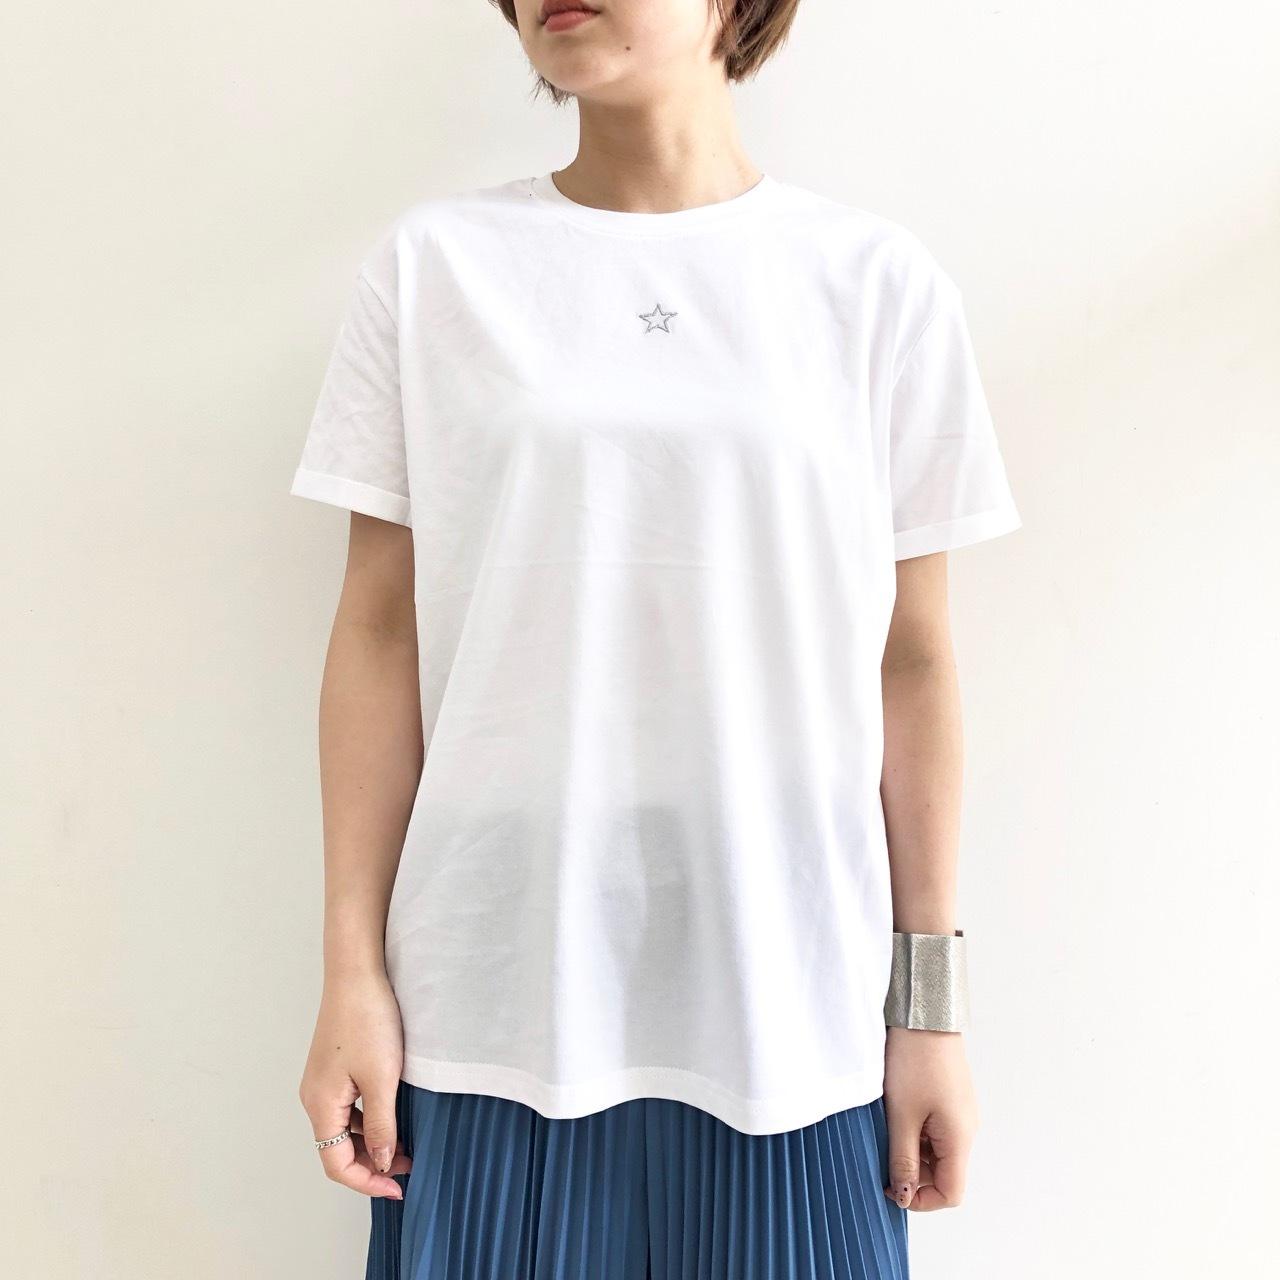 【 Valance Select 】Star Teeシャツ